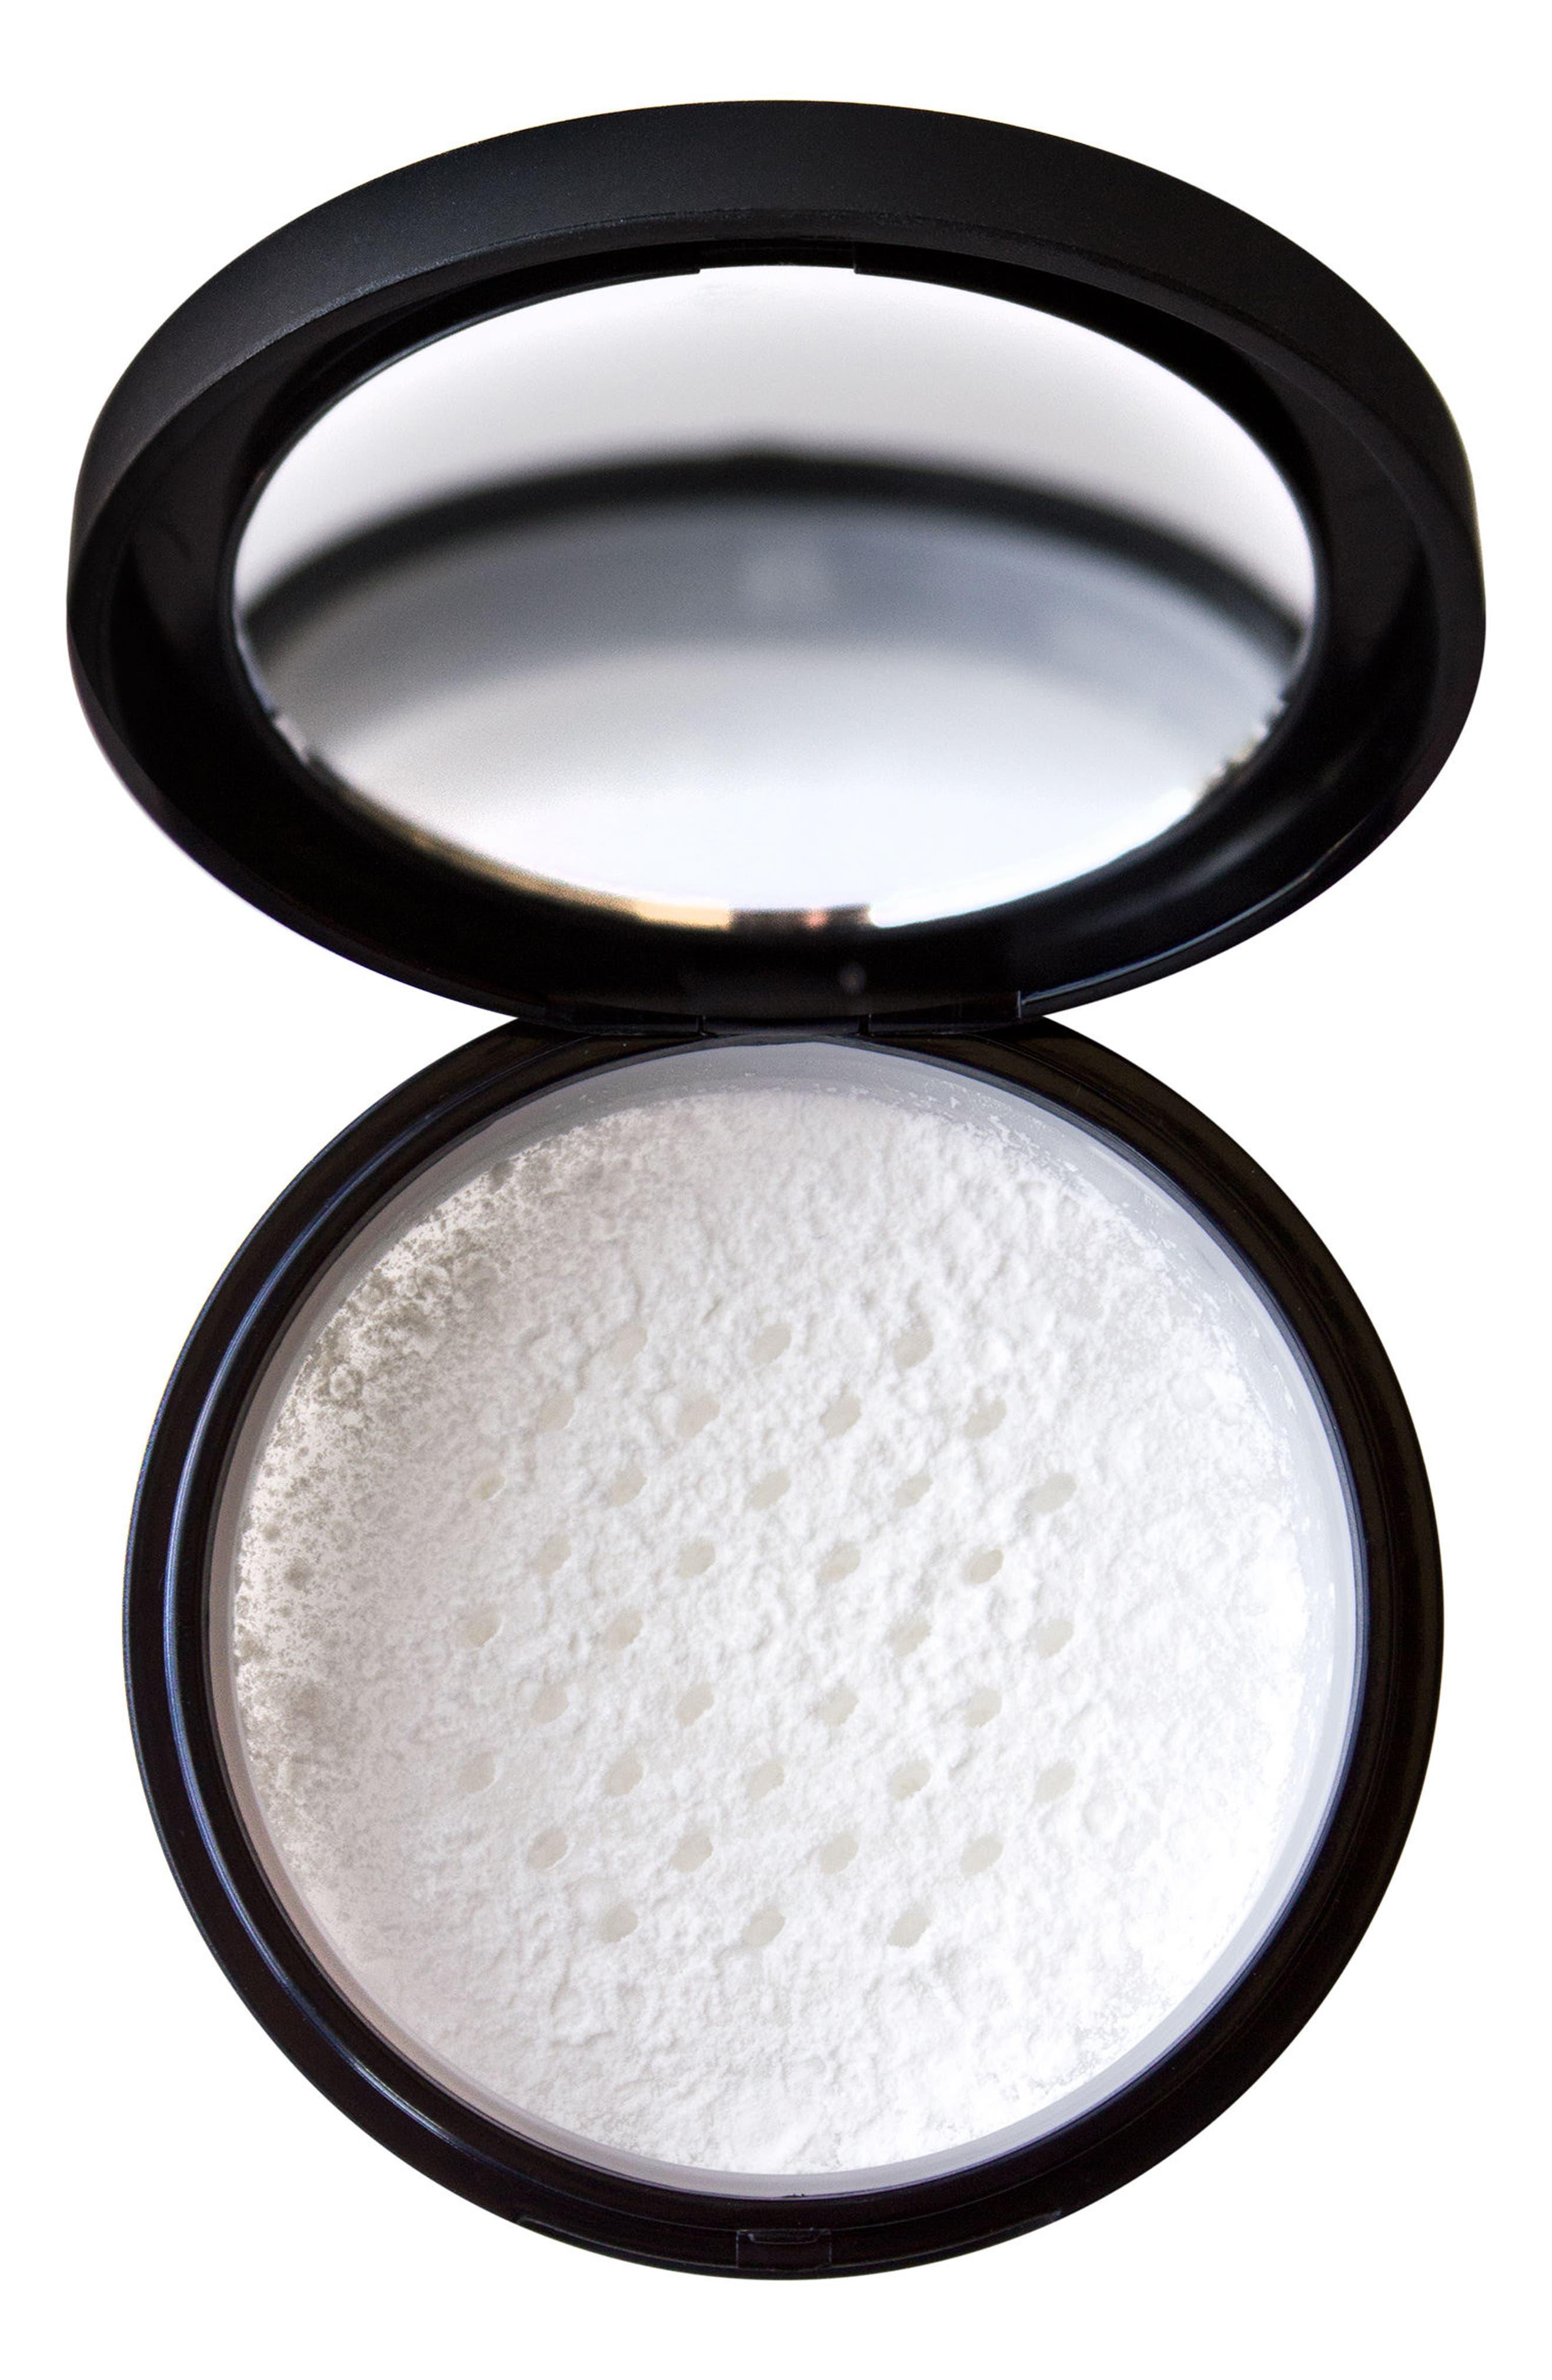 Alternate Image 1 Selected - LORAC PRO Blurring Translucent Loose Powder